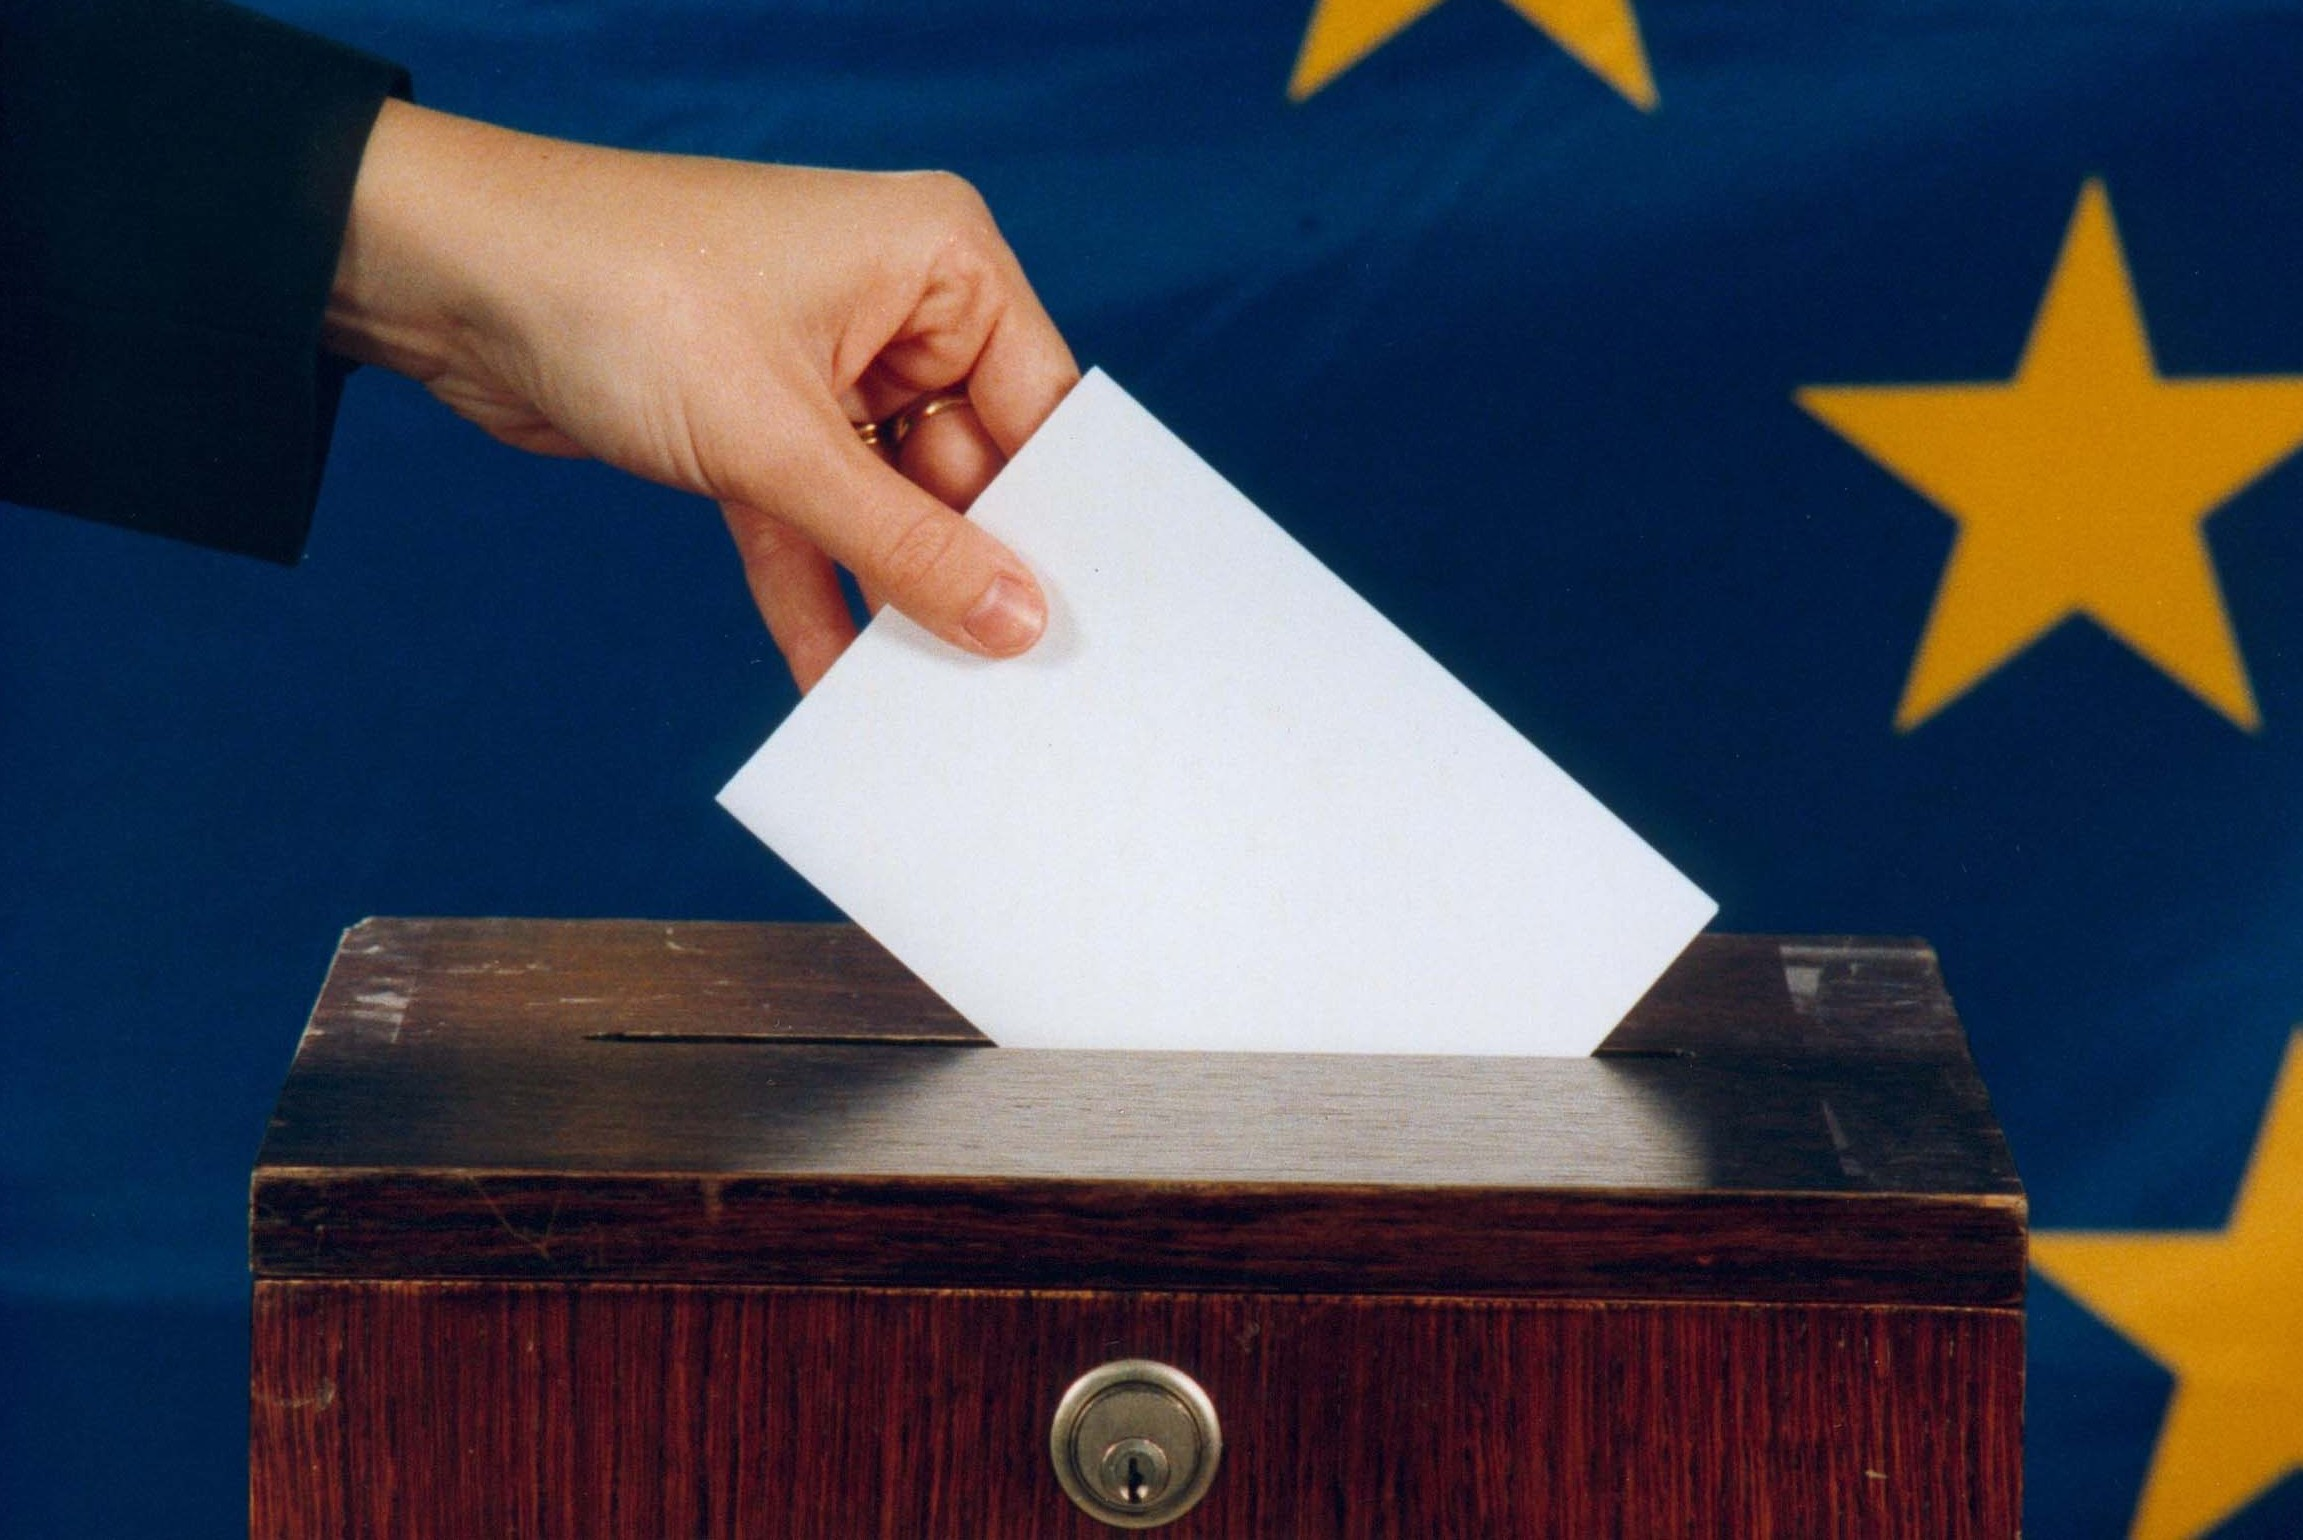 Europennes Bilan Aprs Le Sisme Cahiers Libres